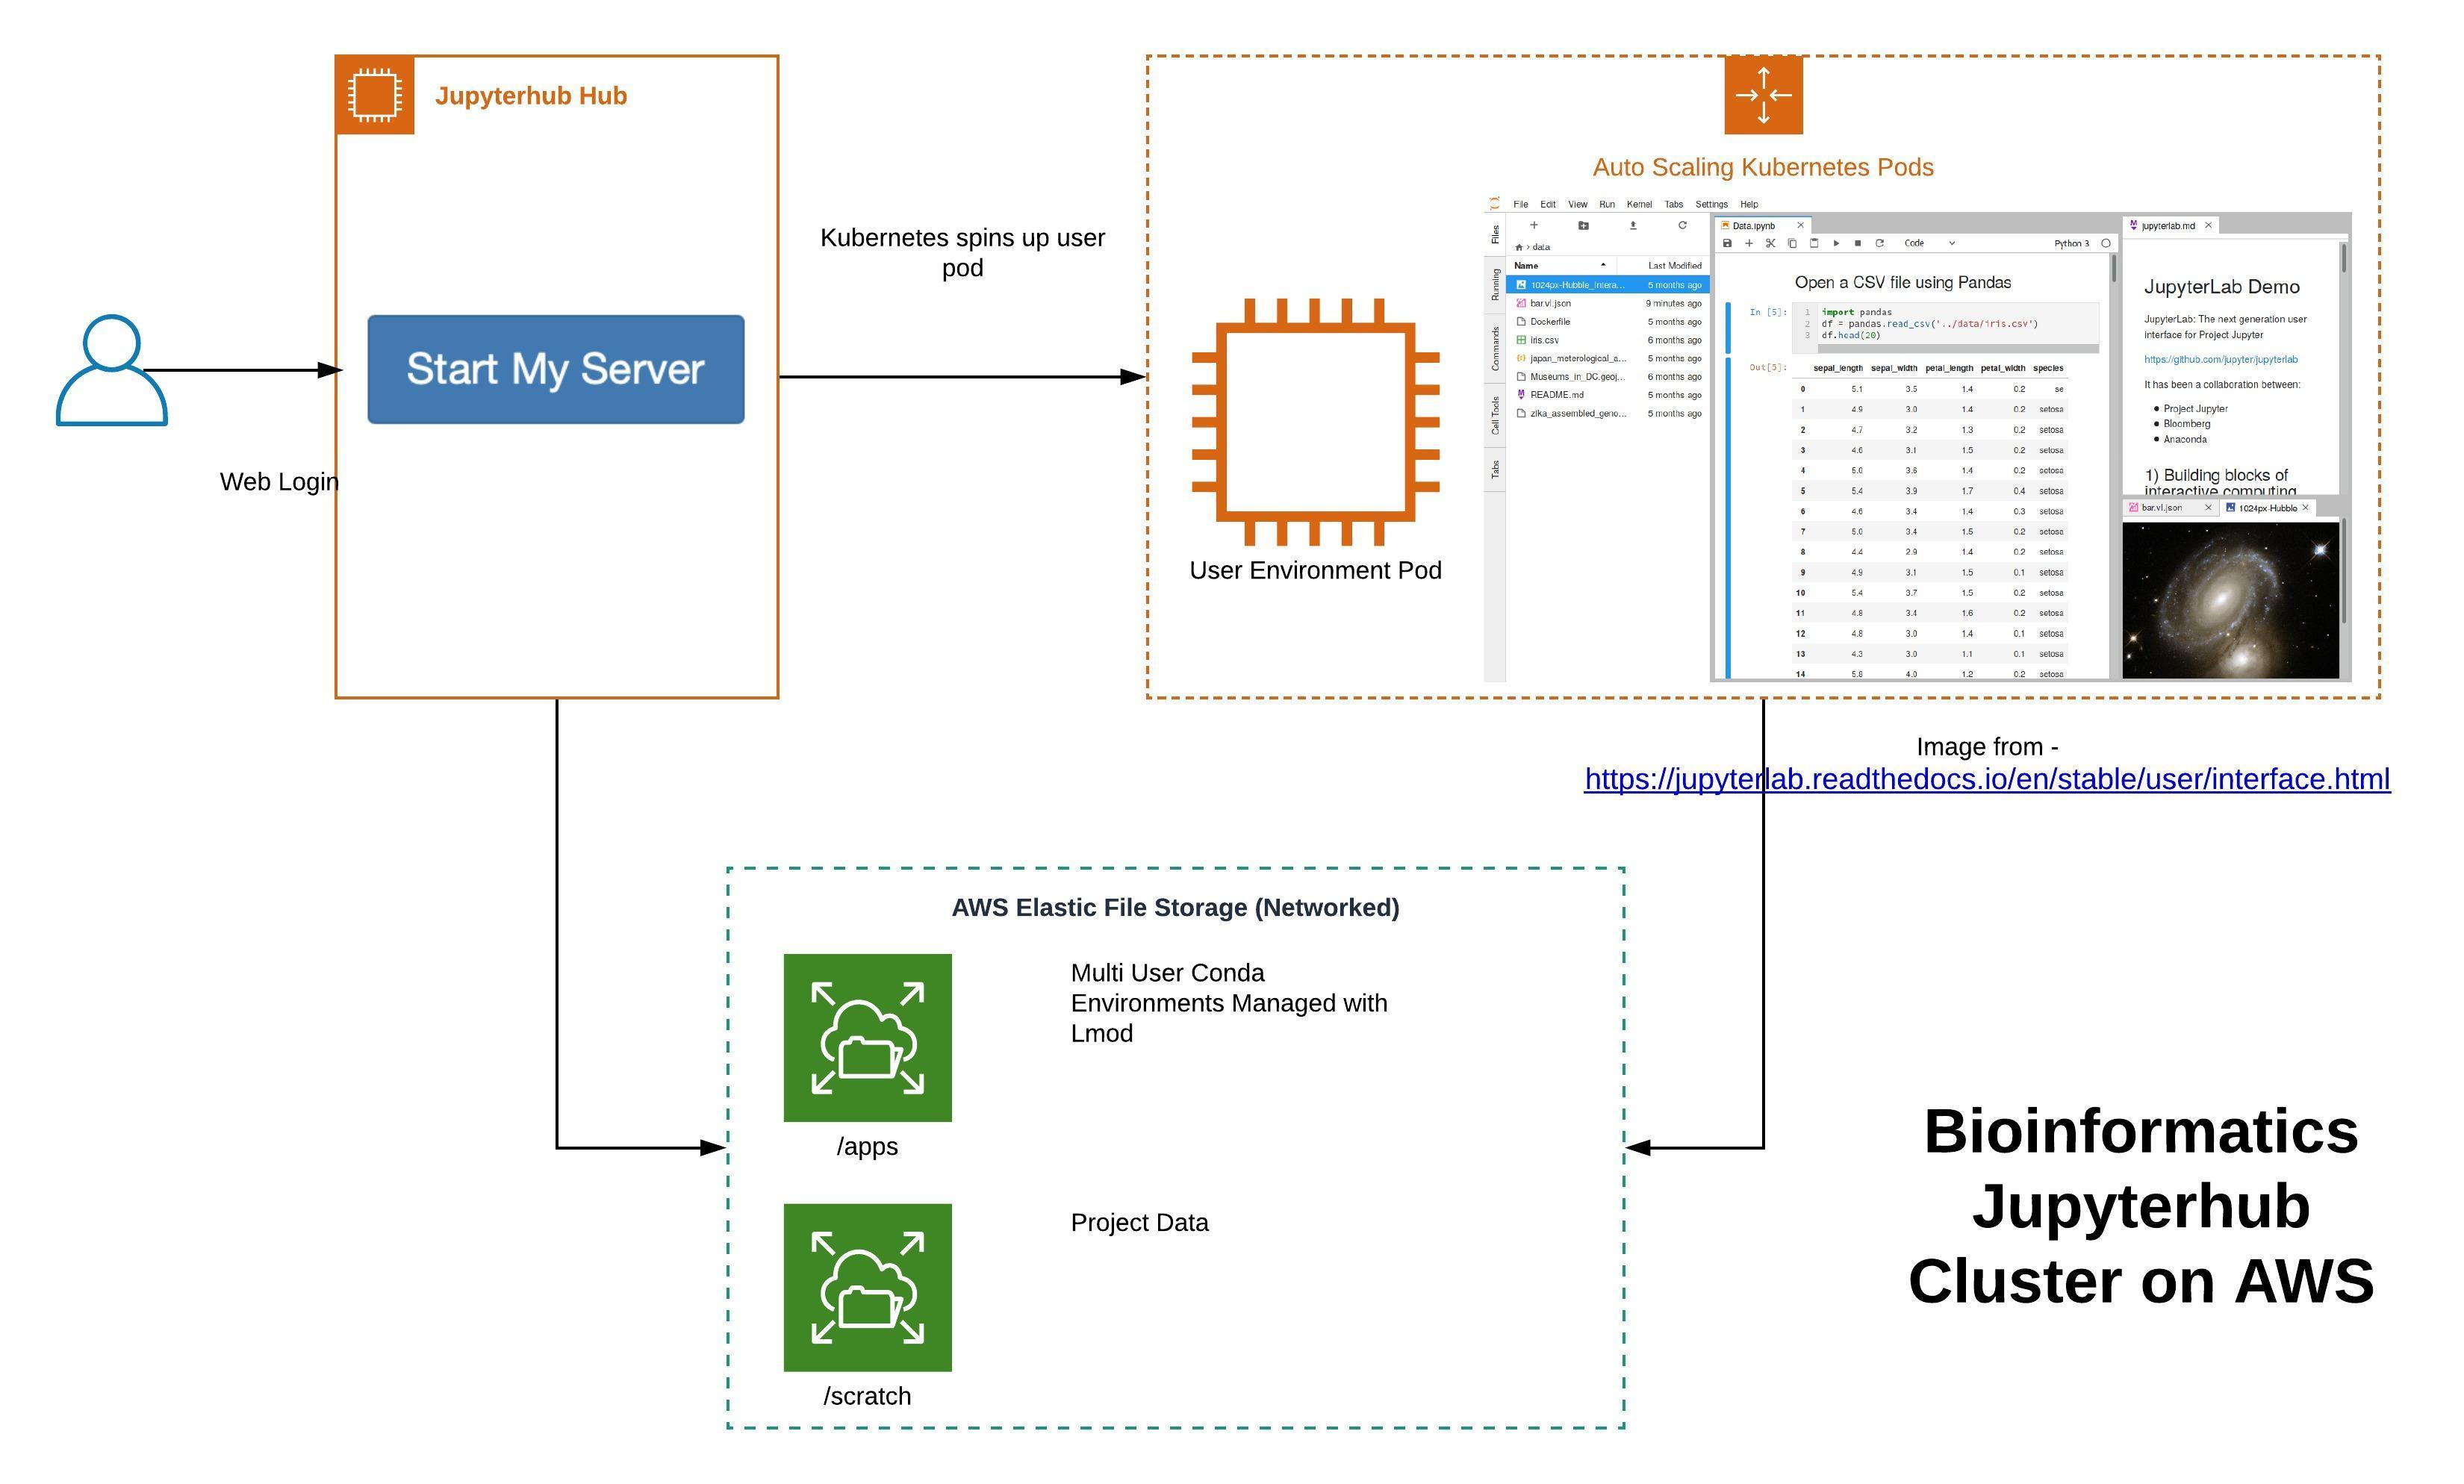 Bioinformatics Jupyterhub Cluster on AWS